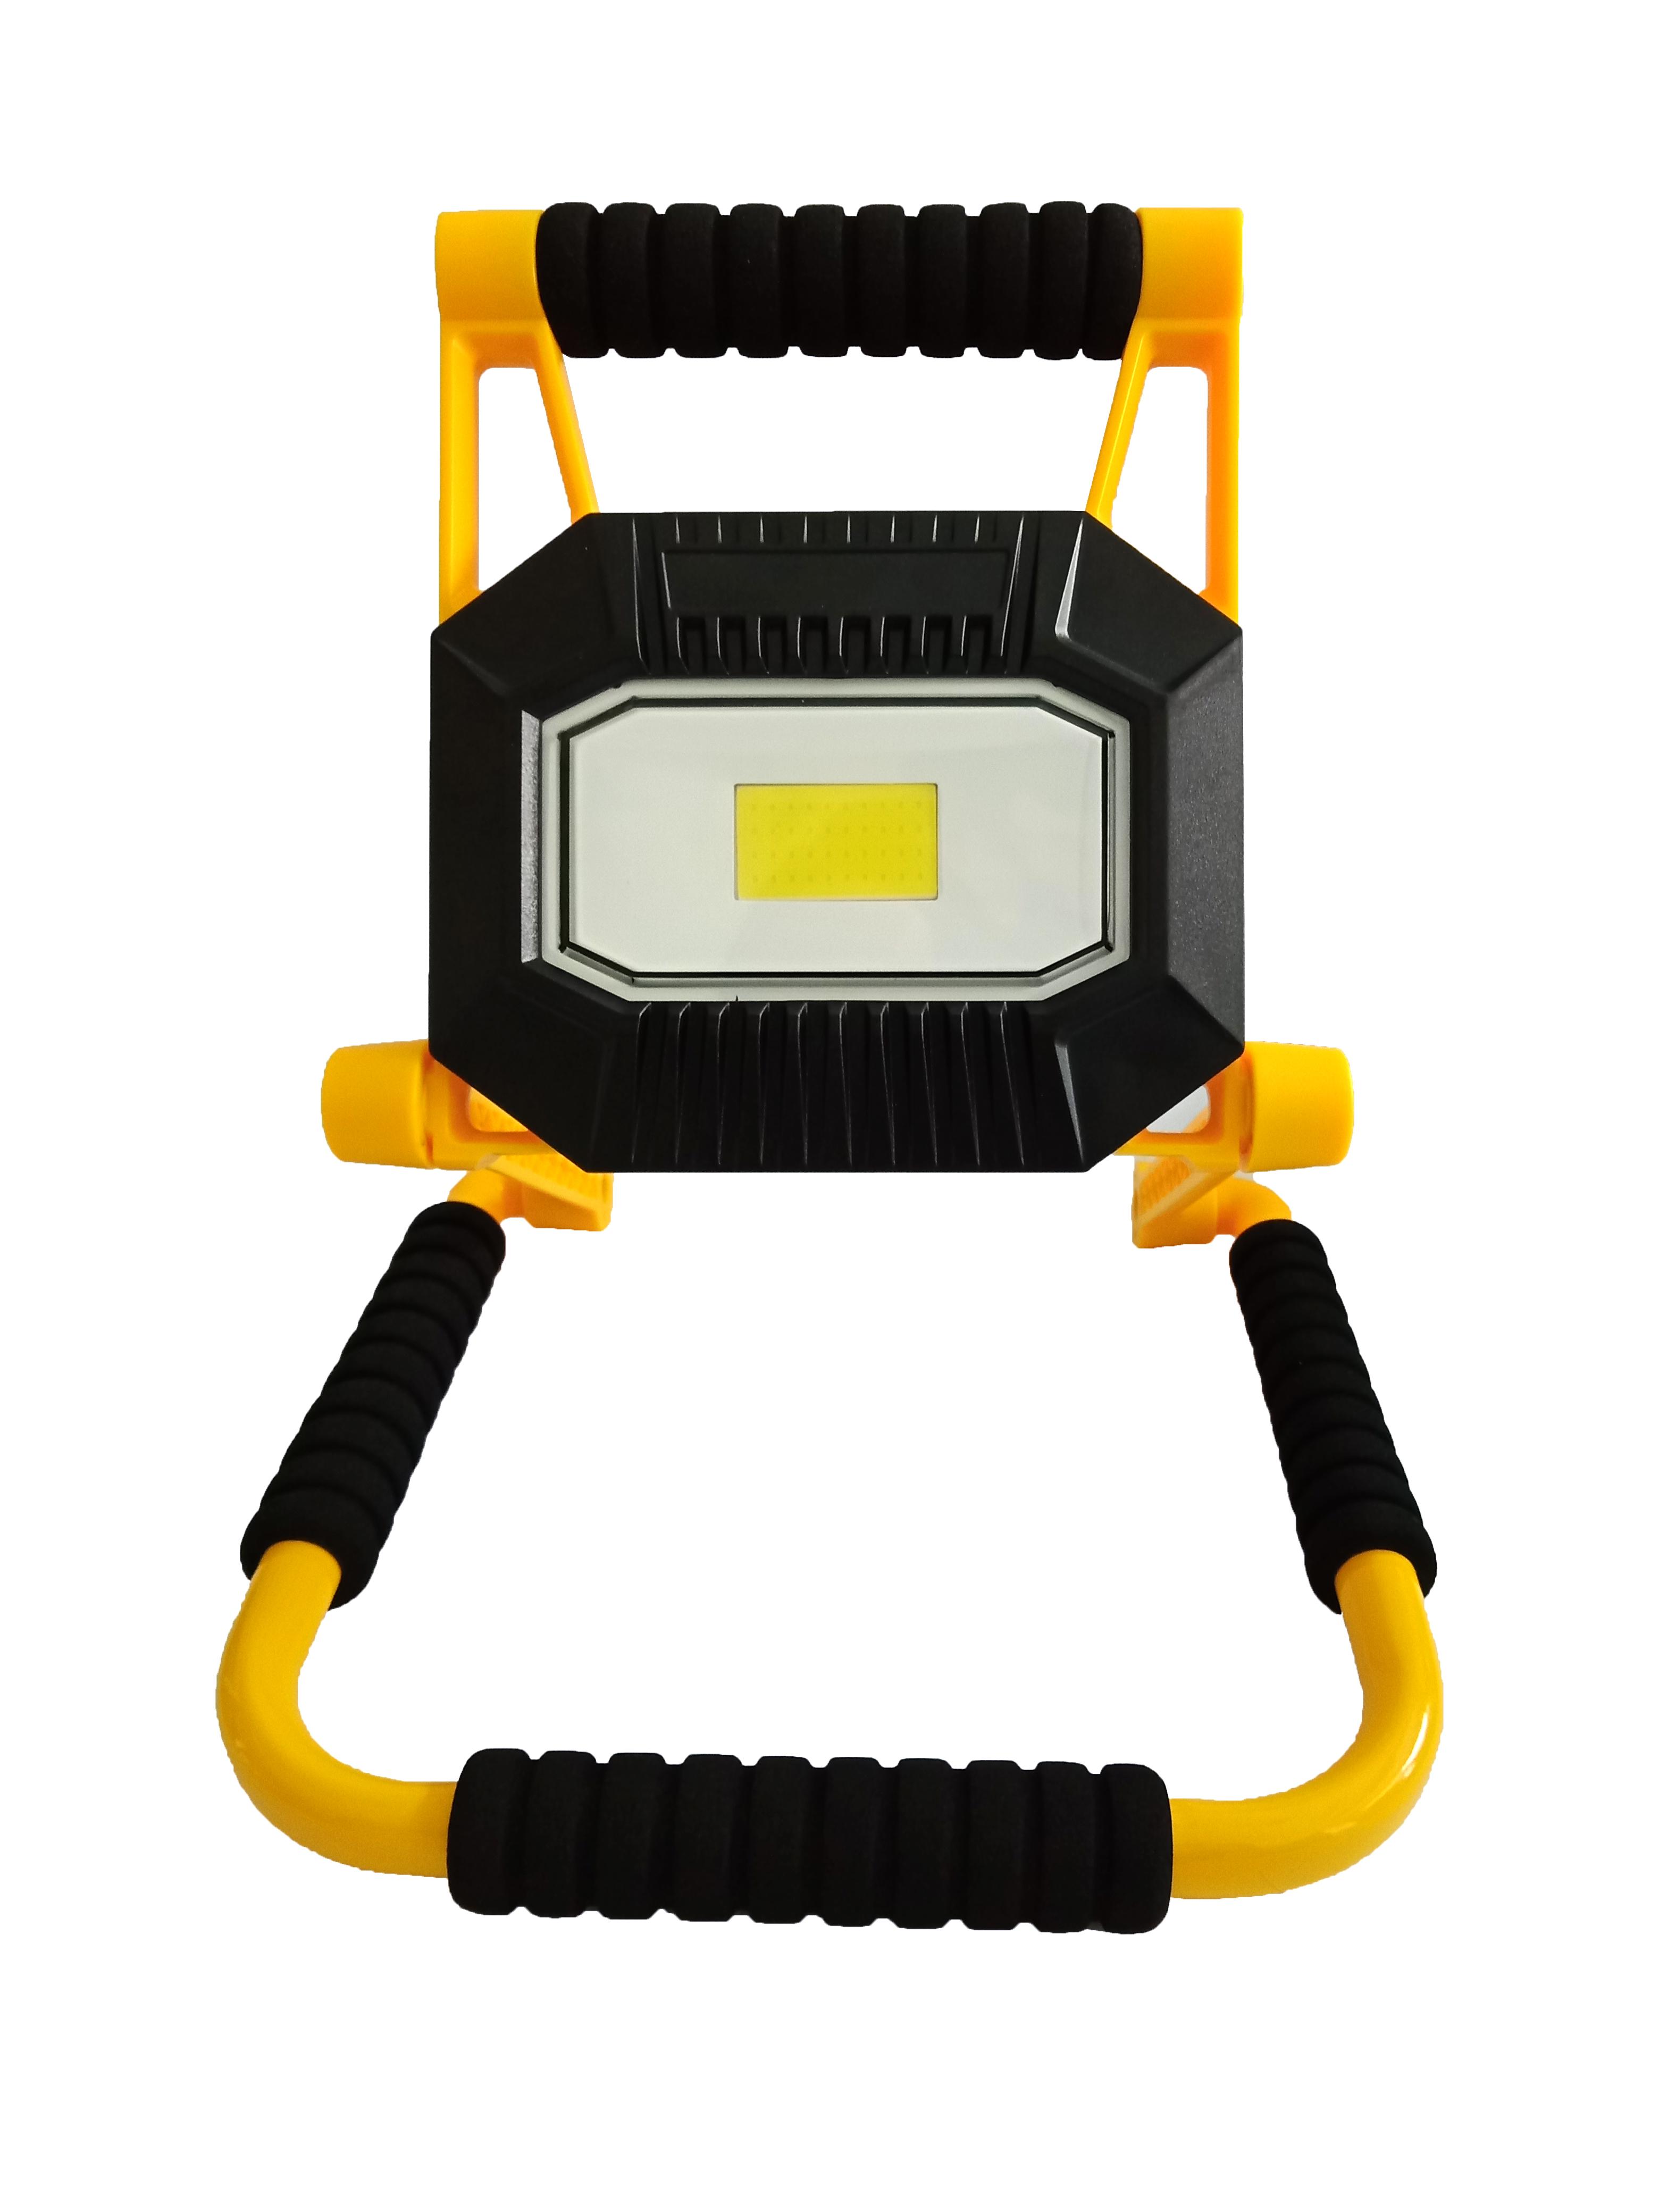 Proiector LED portabil reincarcabil 20W 1400lm IP65 Well [0]